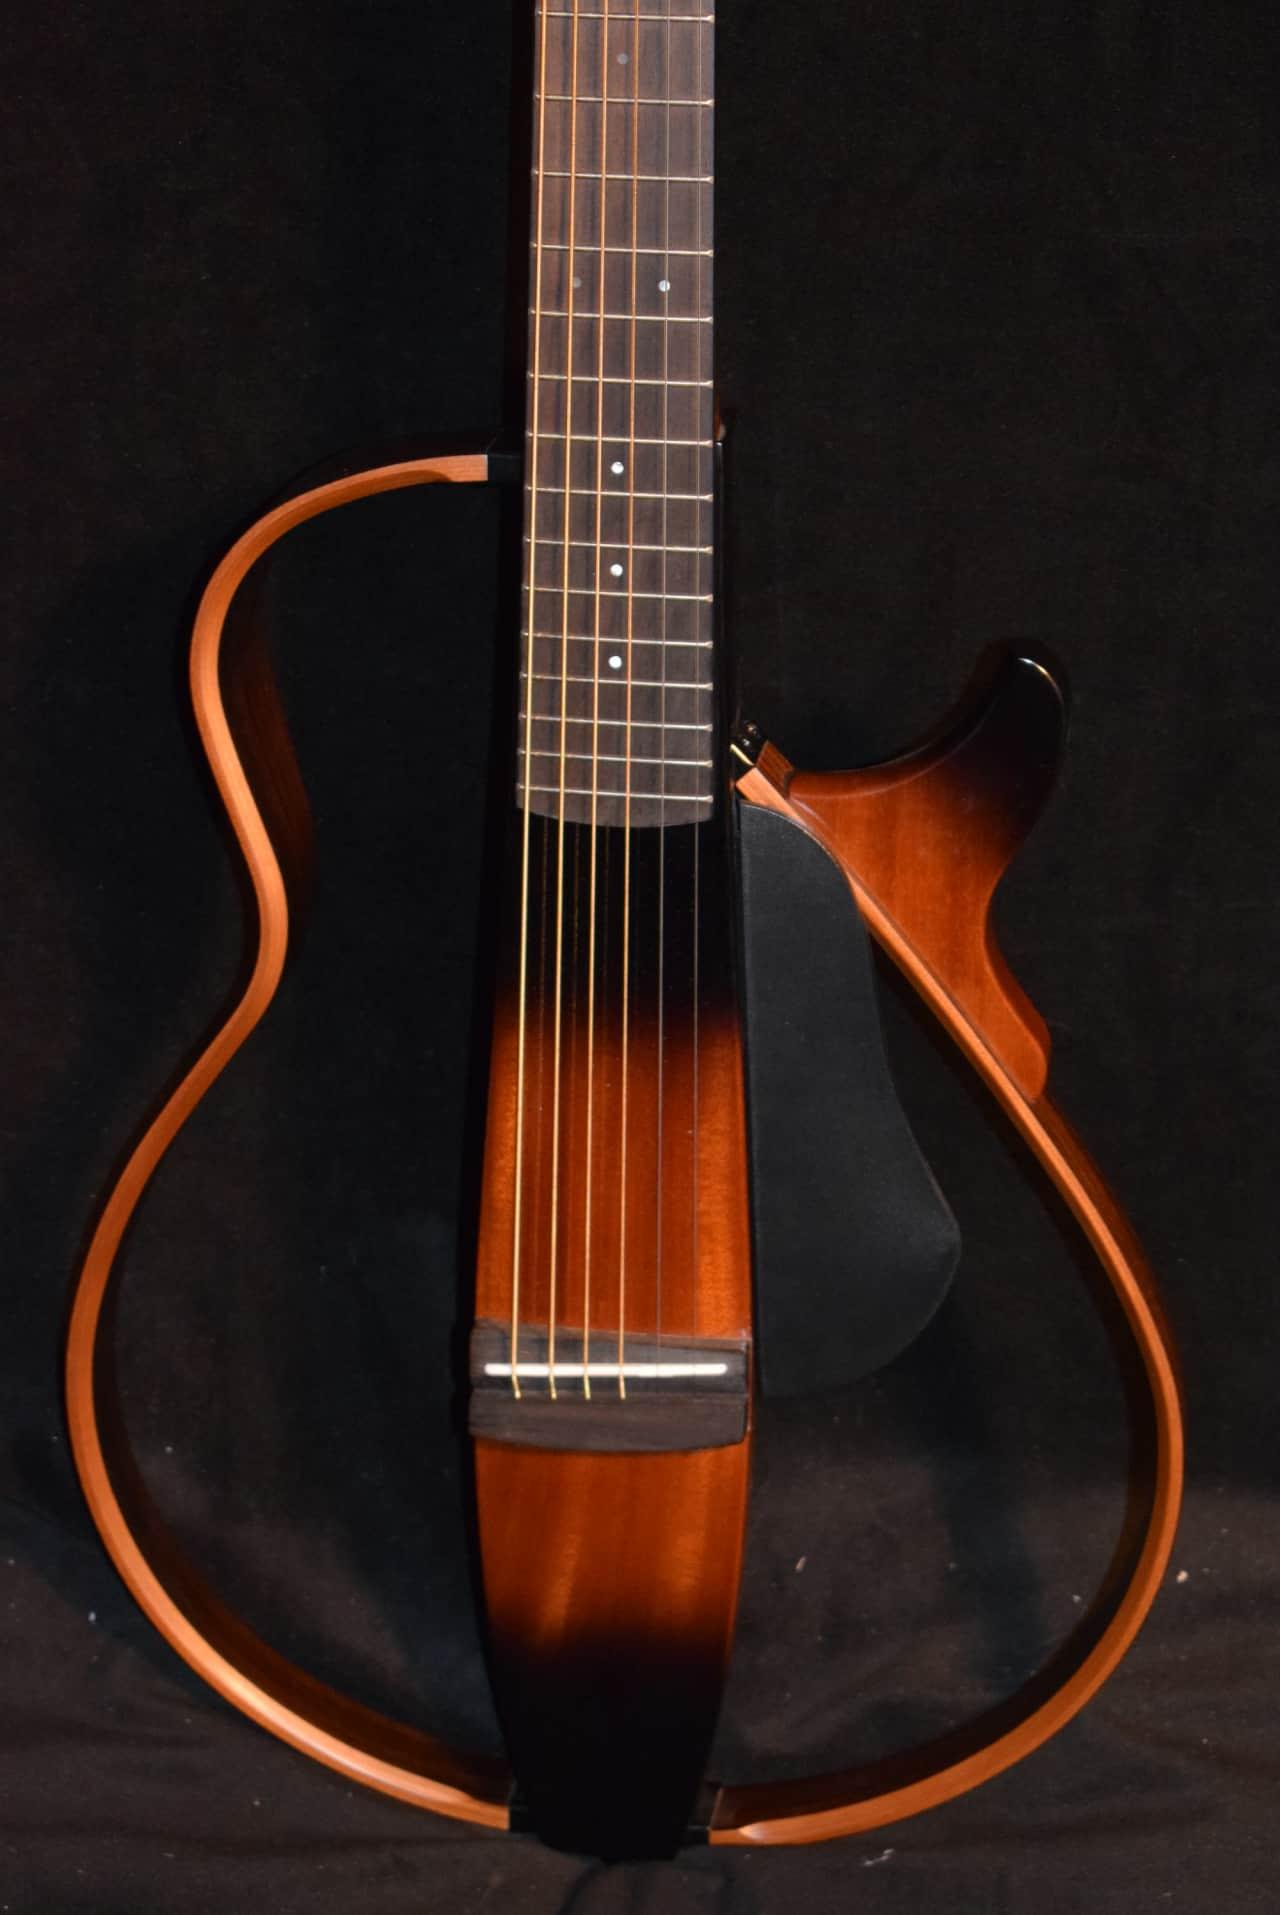 Yamaha slg200s tbs silent steel string tobacco sunburst for Yamaha slg200s steel string silent guitar